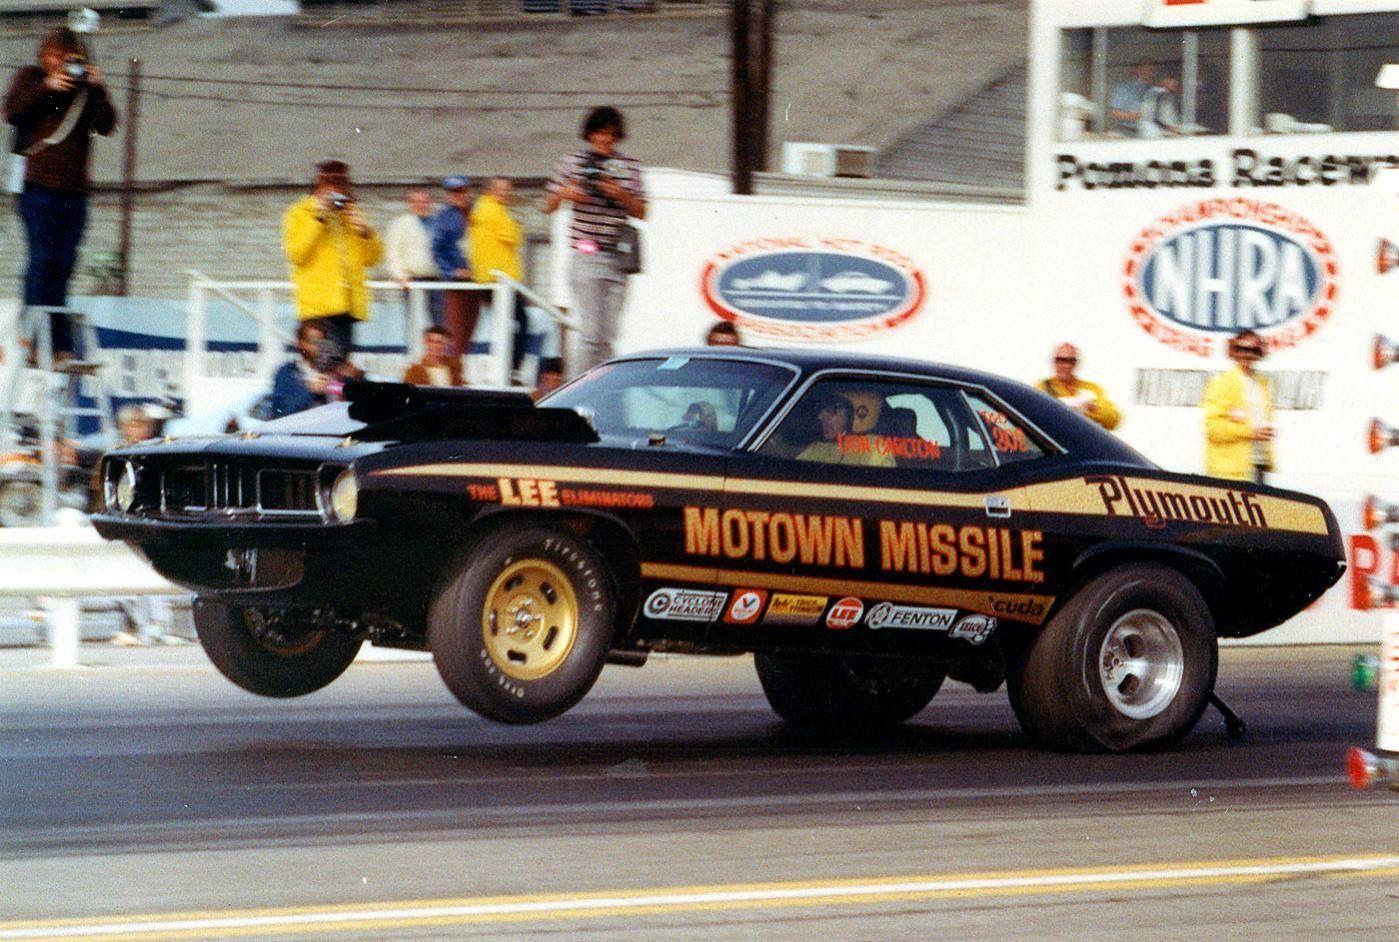 Vintage Drag Racing Pro Stock Motown Missile Drag Racing Nhra Drag Racing Drag Racing Cars